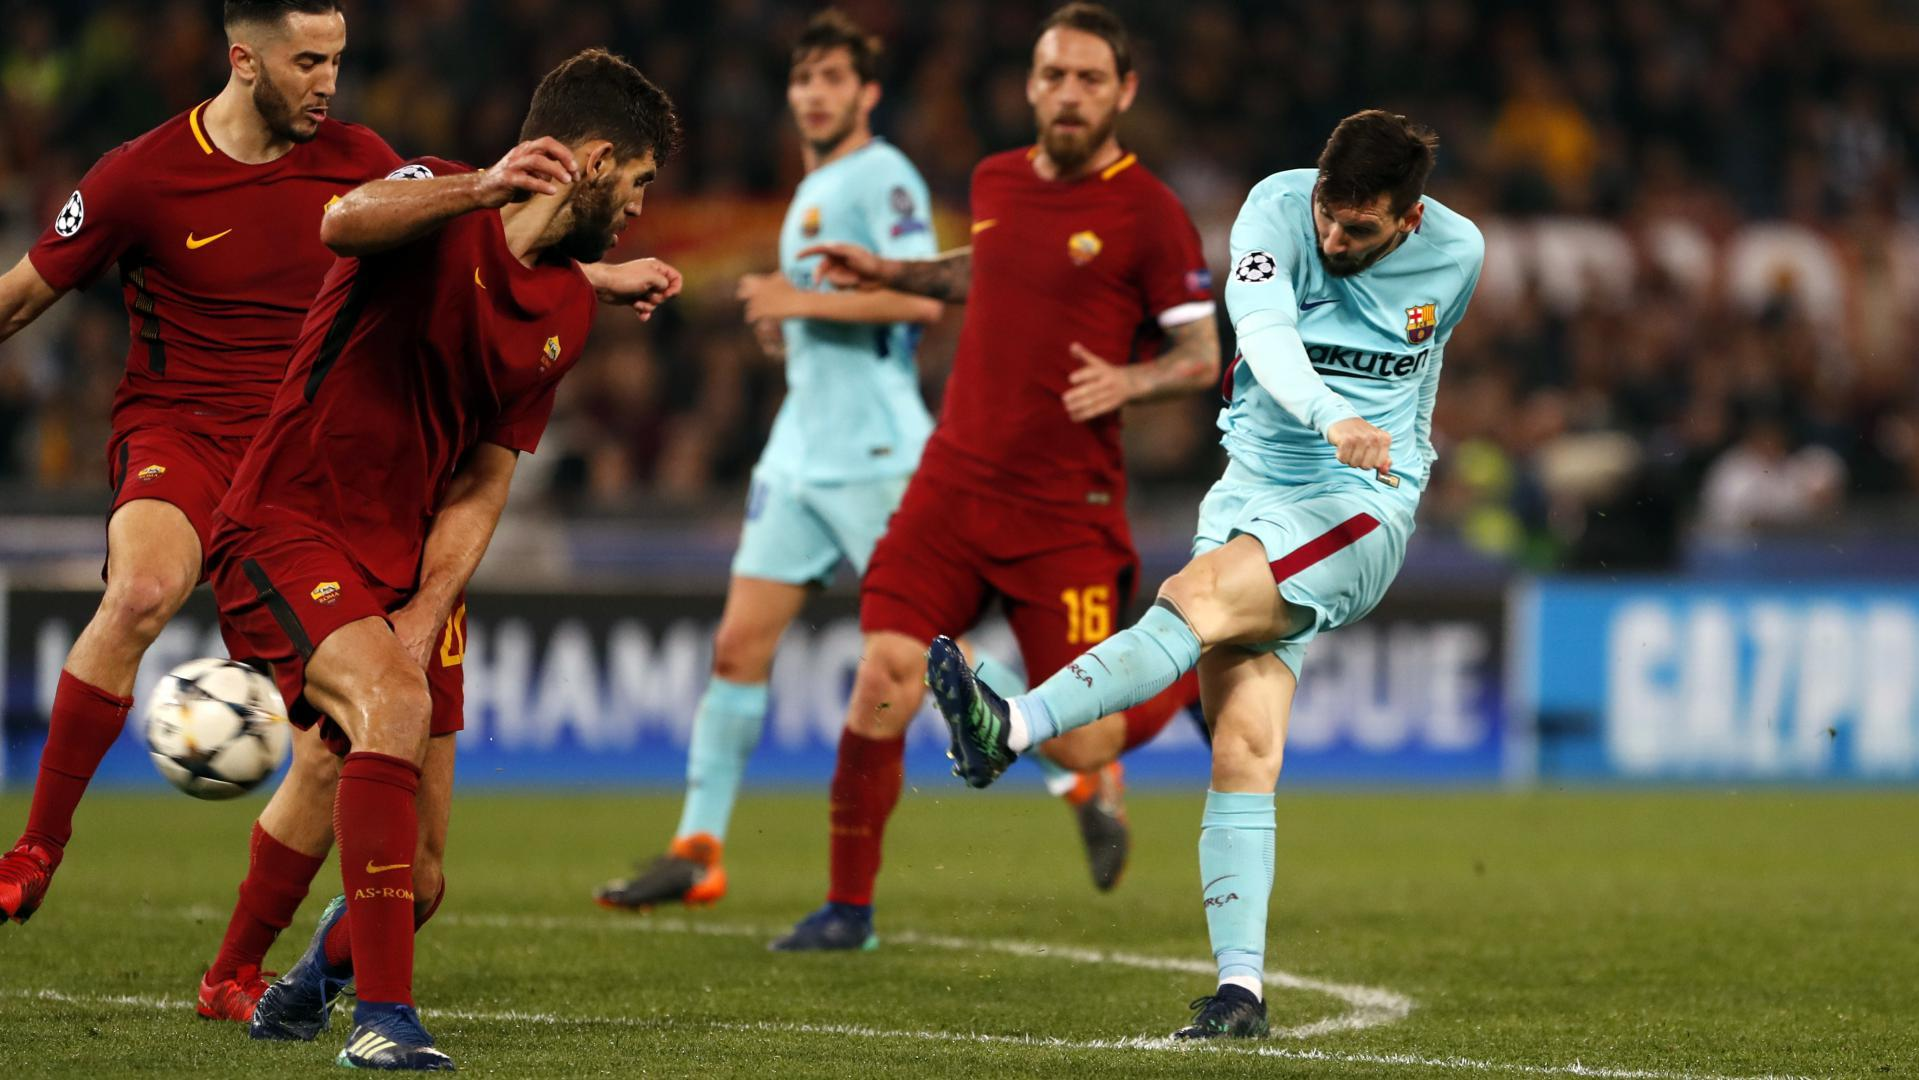 As Rom Vs Barcelona